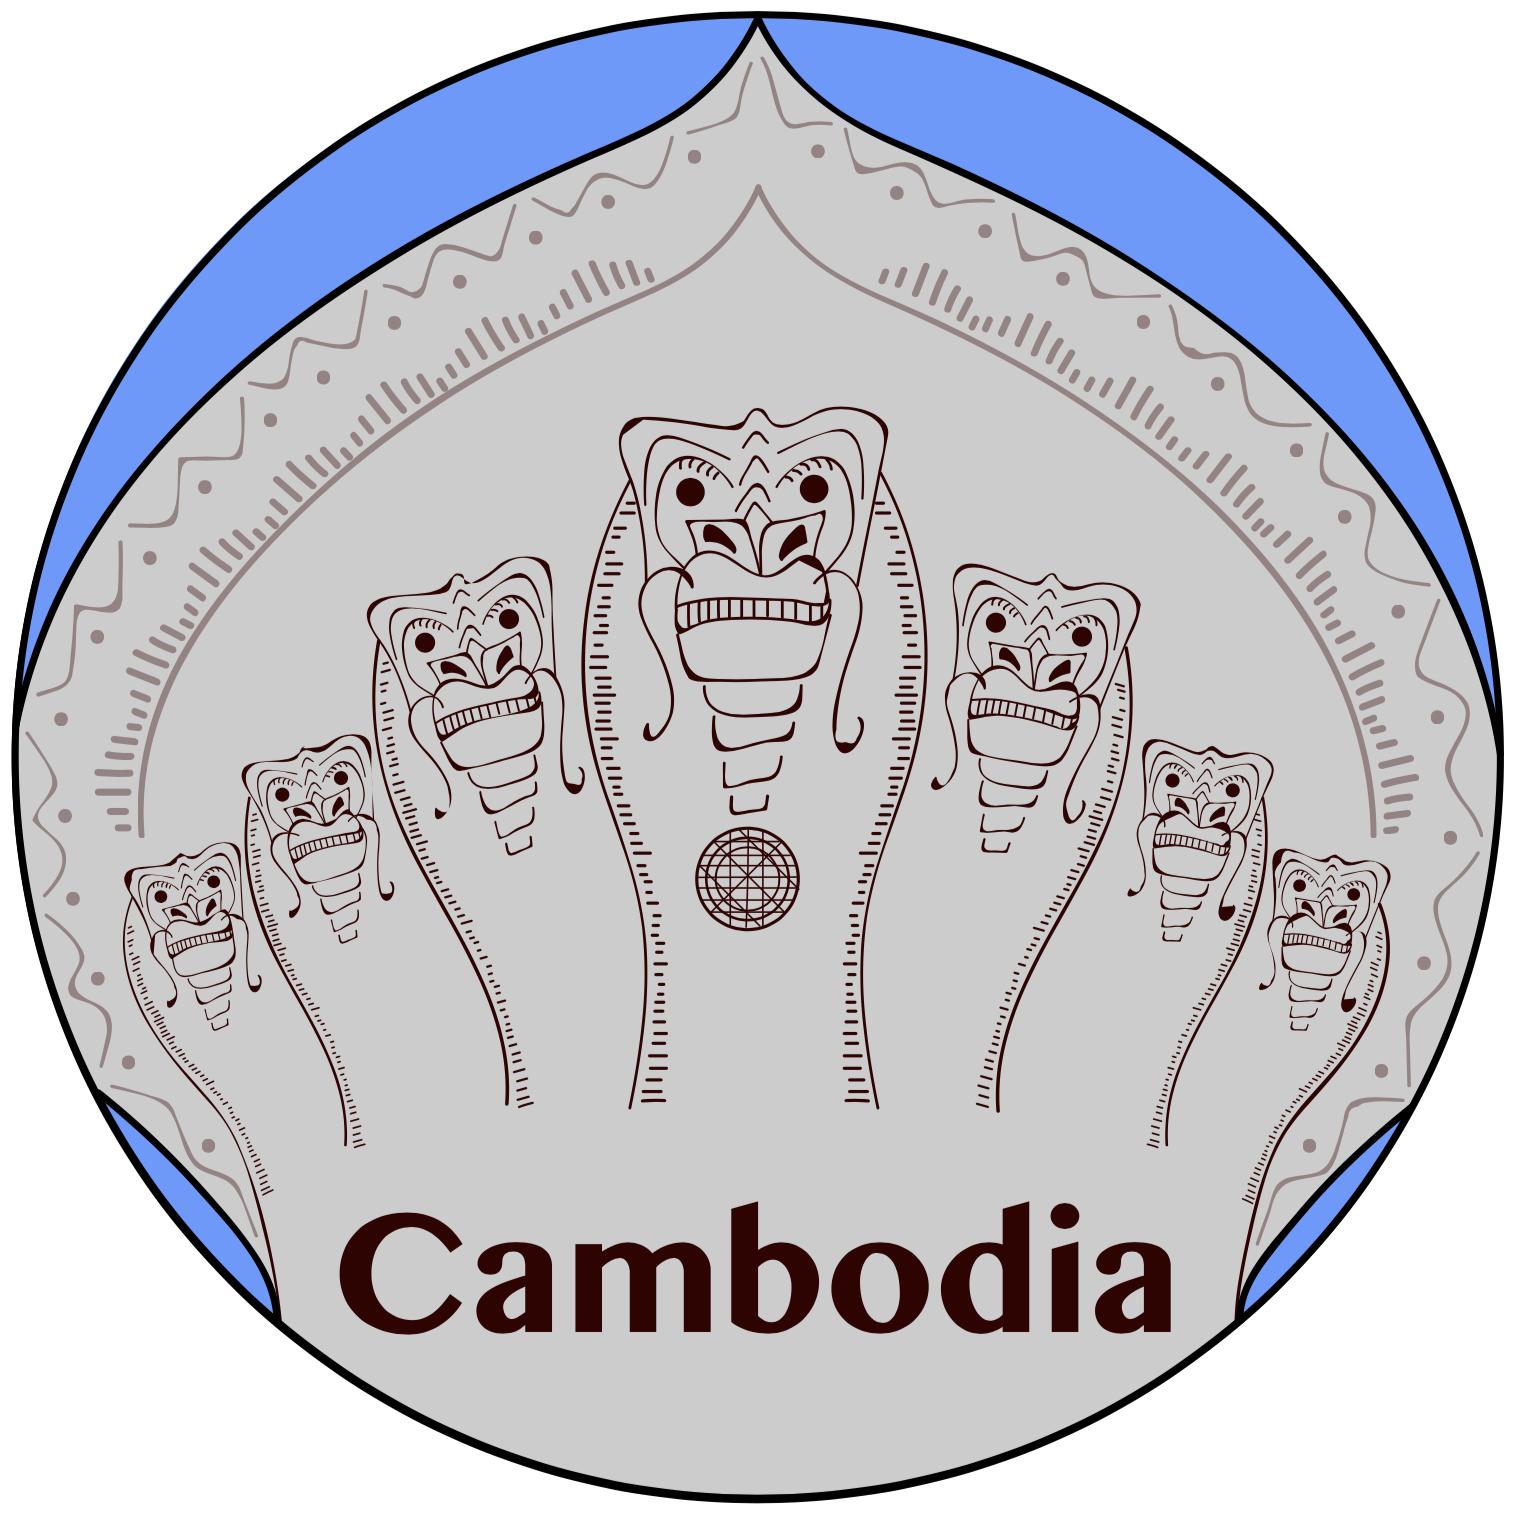 CambodiaStamp_FINAL3.png